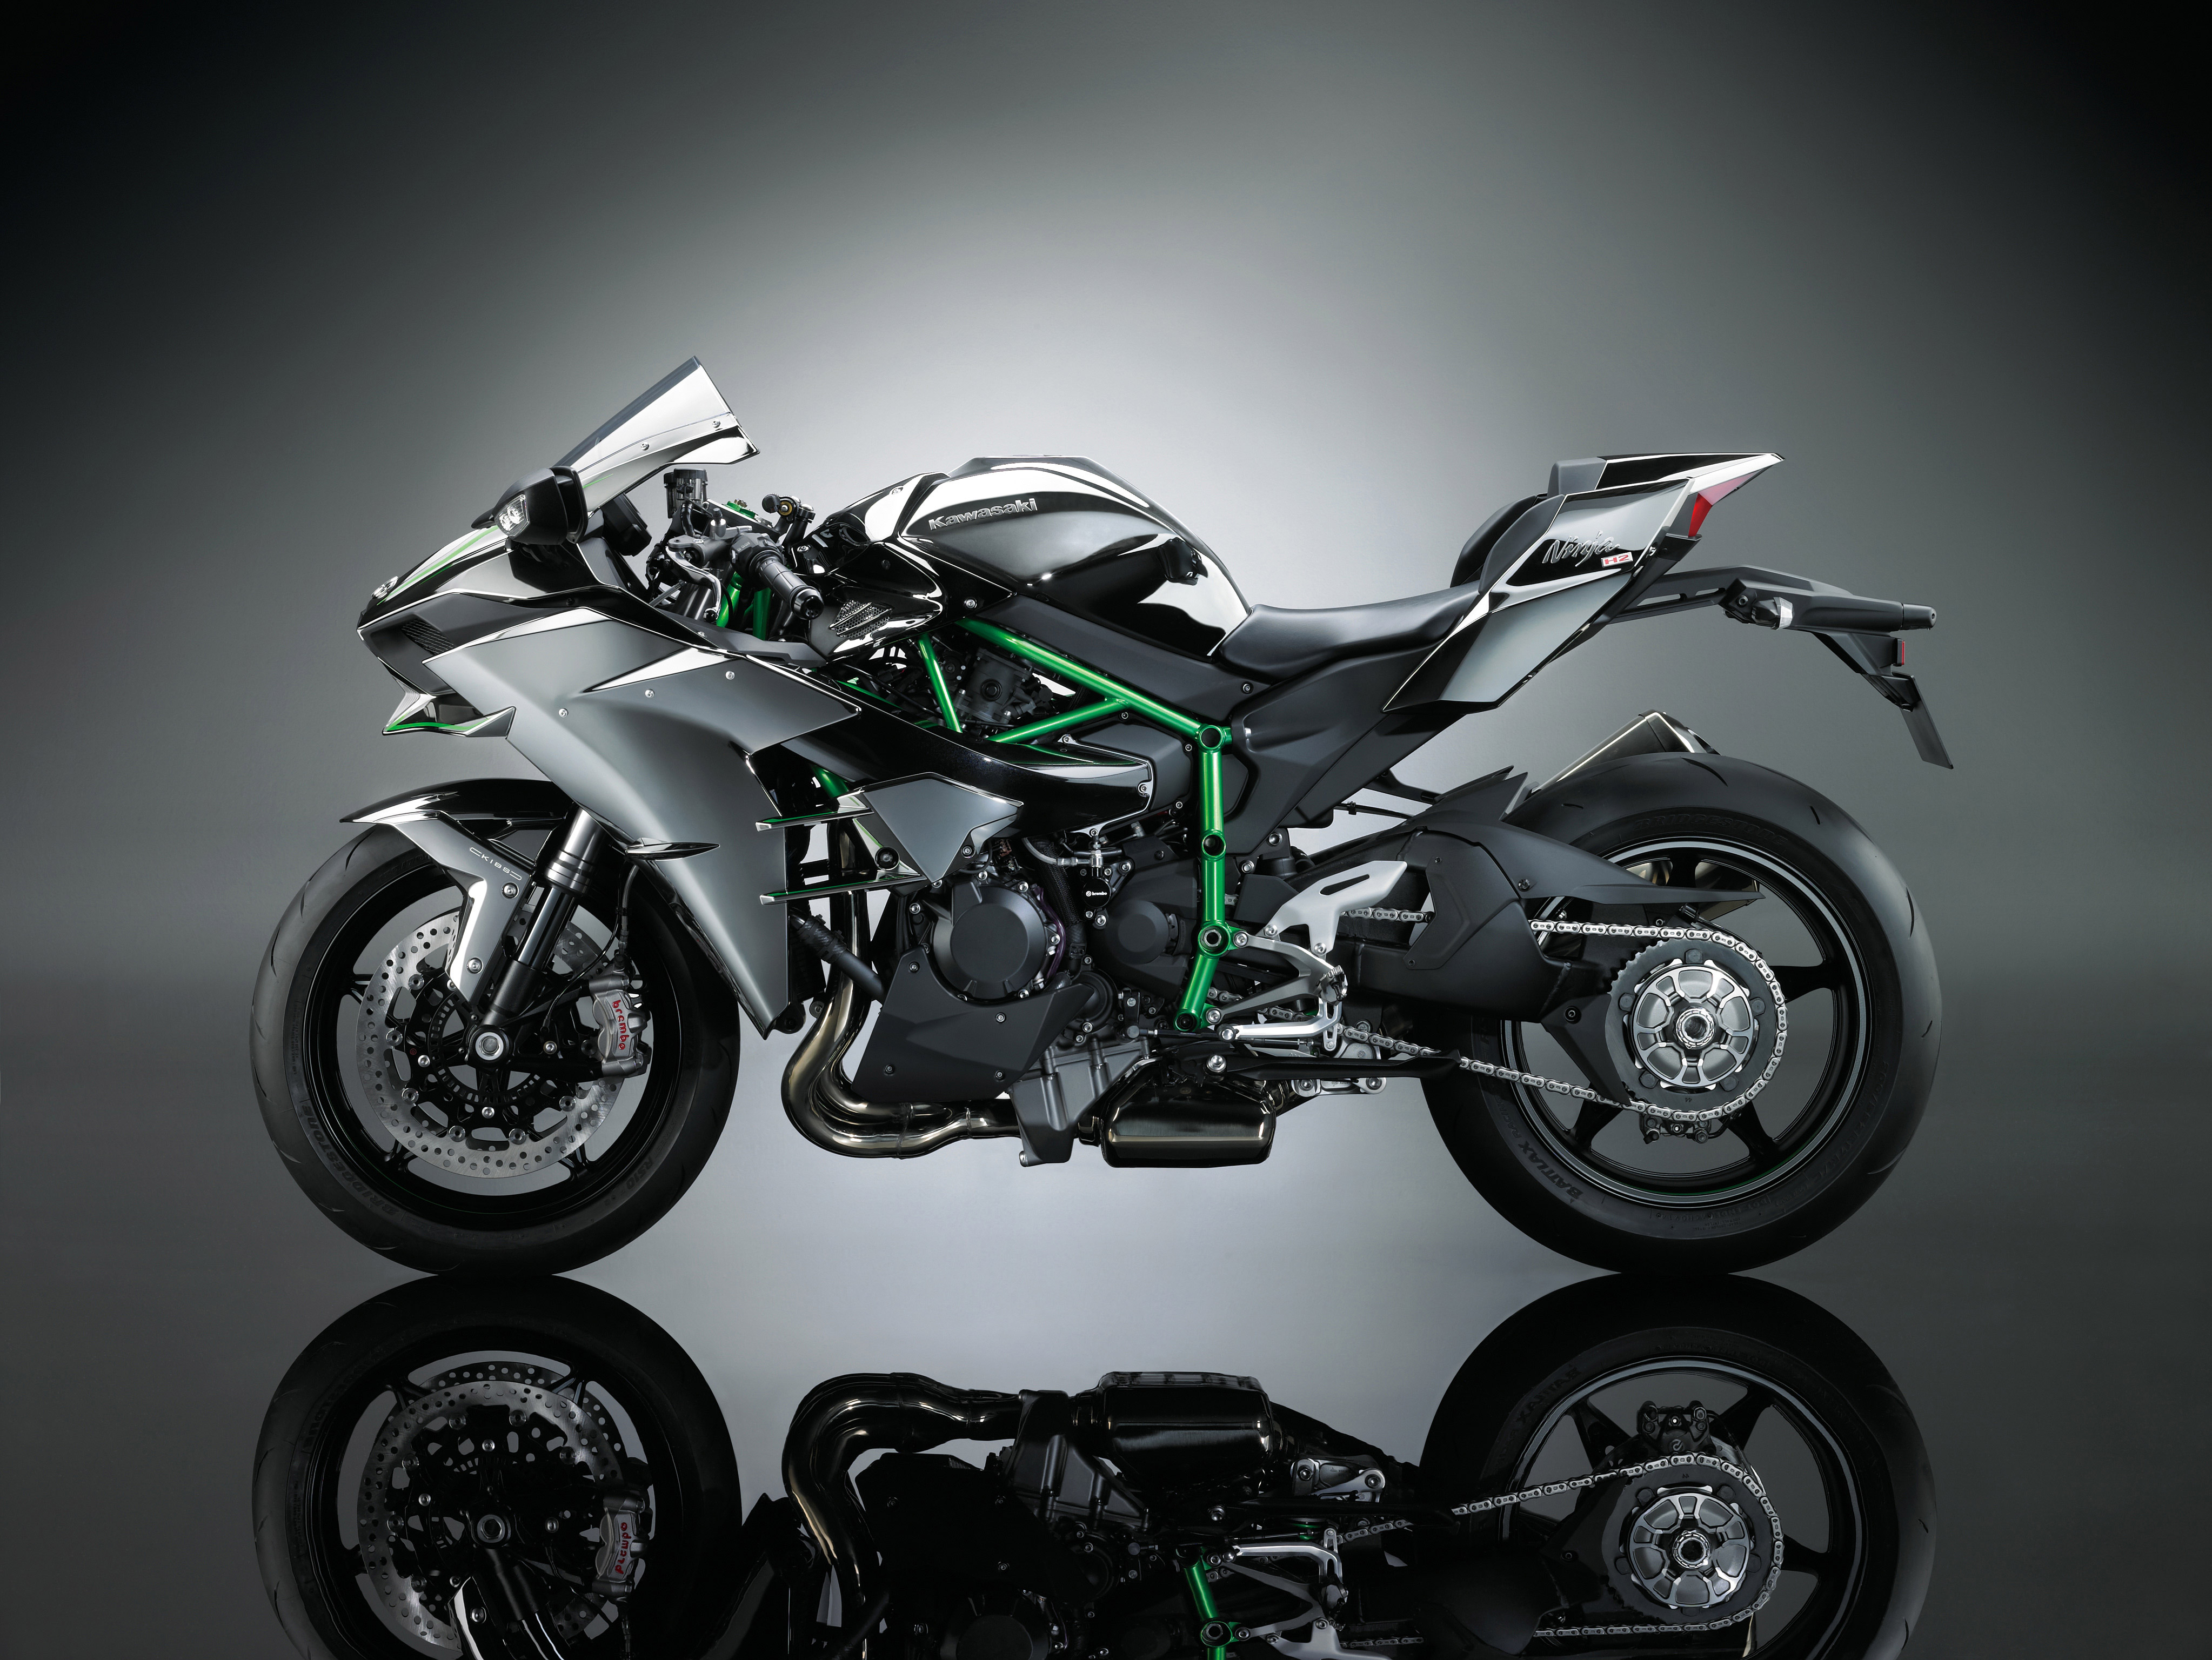 Kawasaki Ninja H2 4k Hd Bikes 4k Wallpapers Images